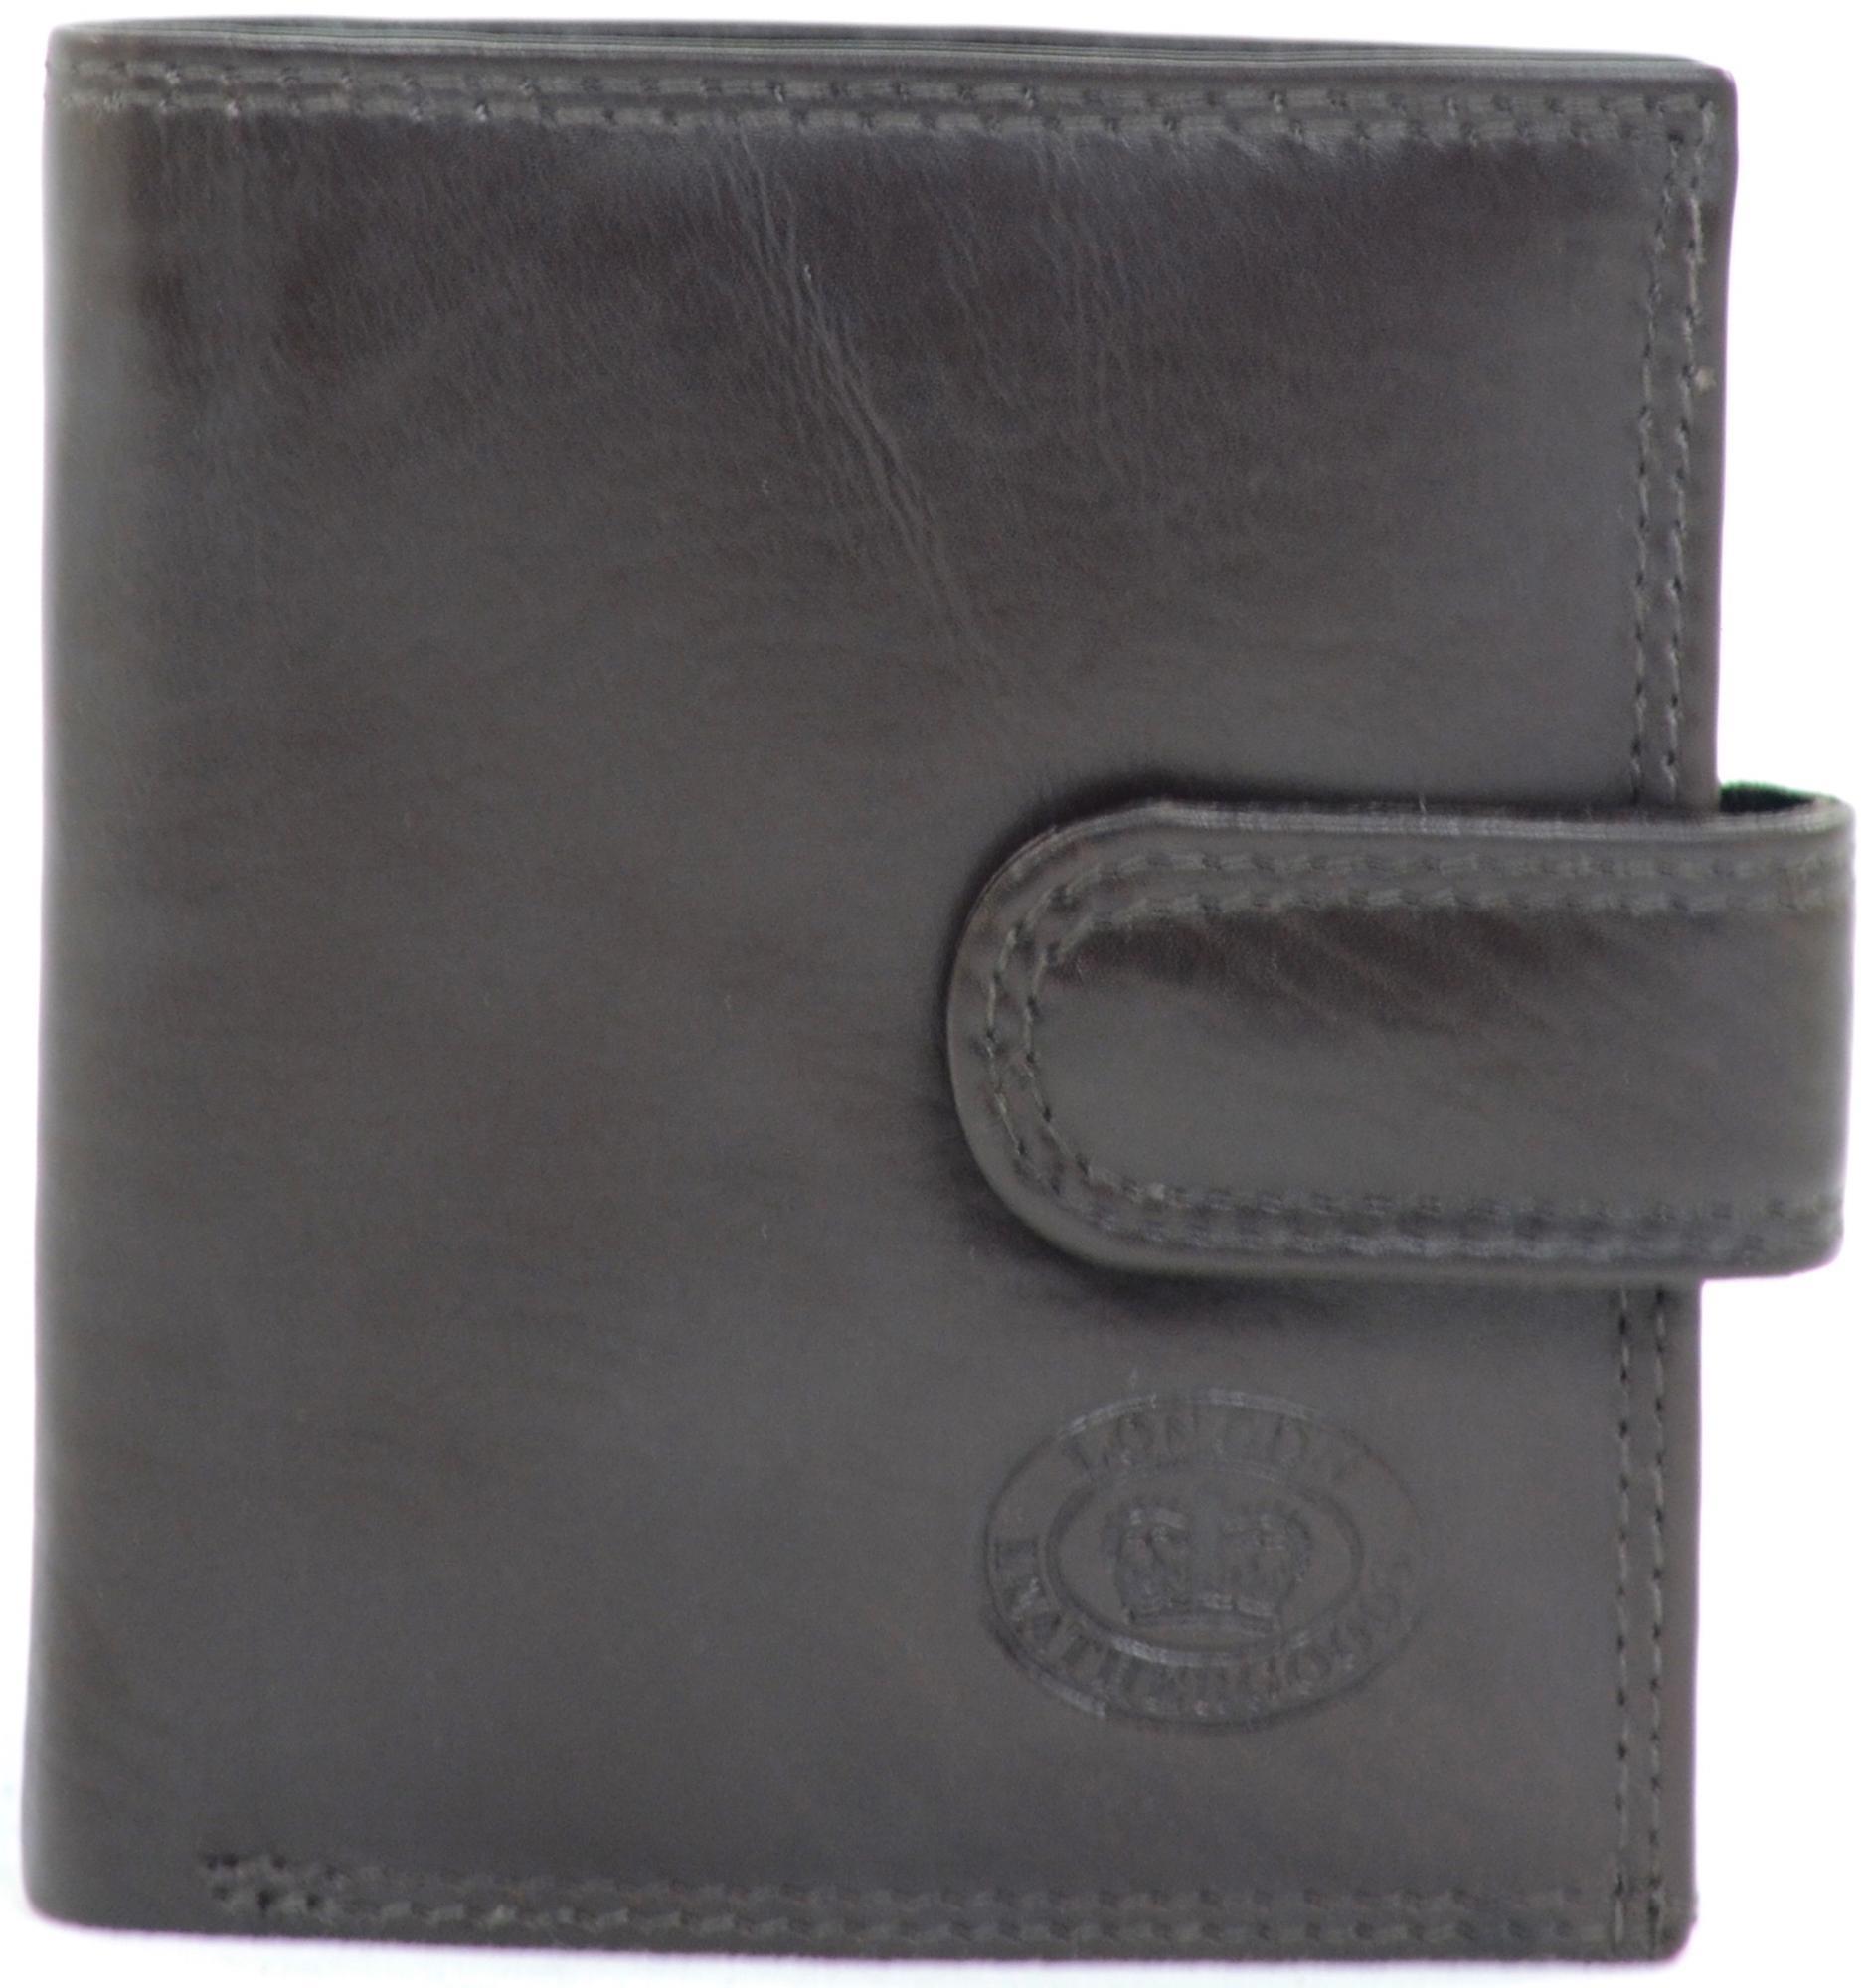 Mens Leather Bi-Fold Credit Card / Money / Coin Wallet - Dark Brown